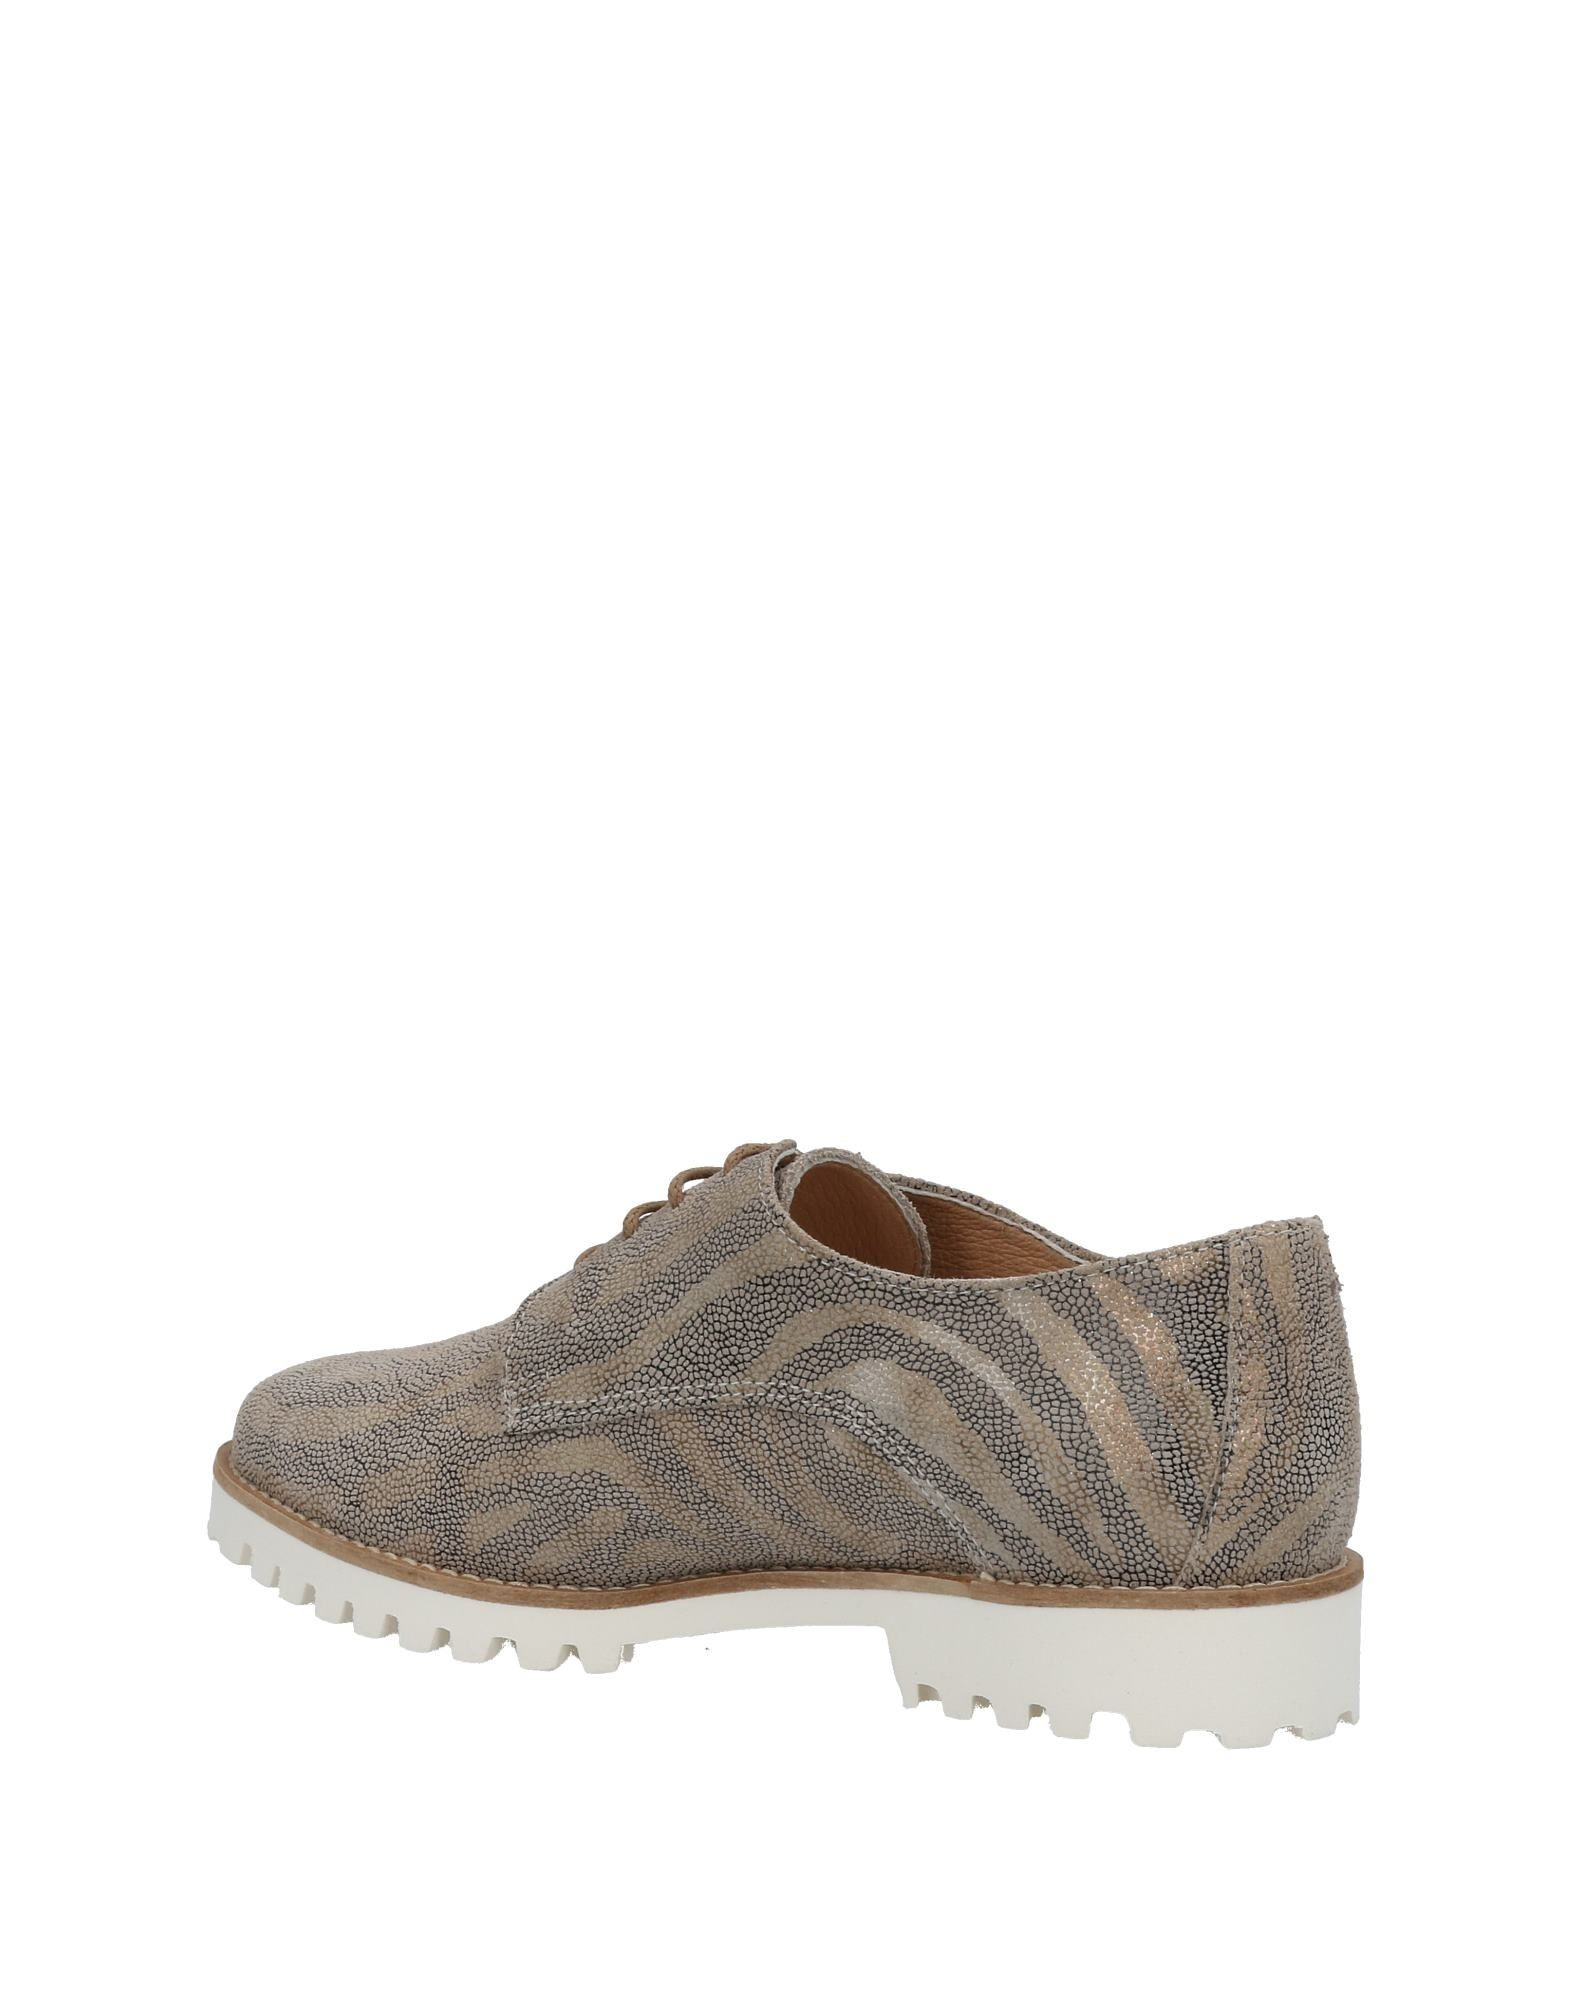 CHAUSSURES - Chaussures à lacetsAbarca AjfO6PesDS